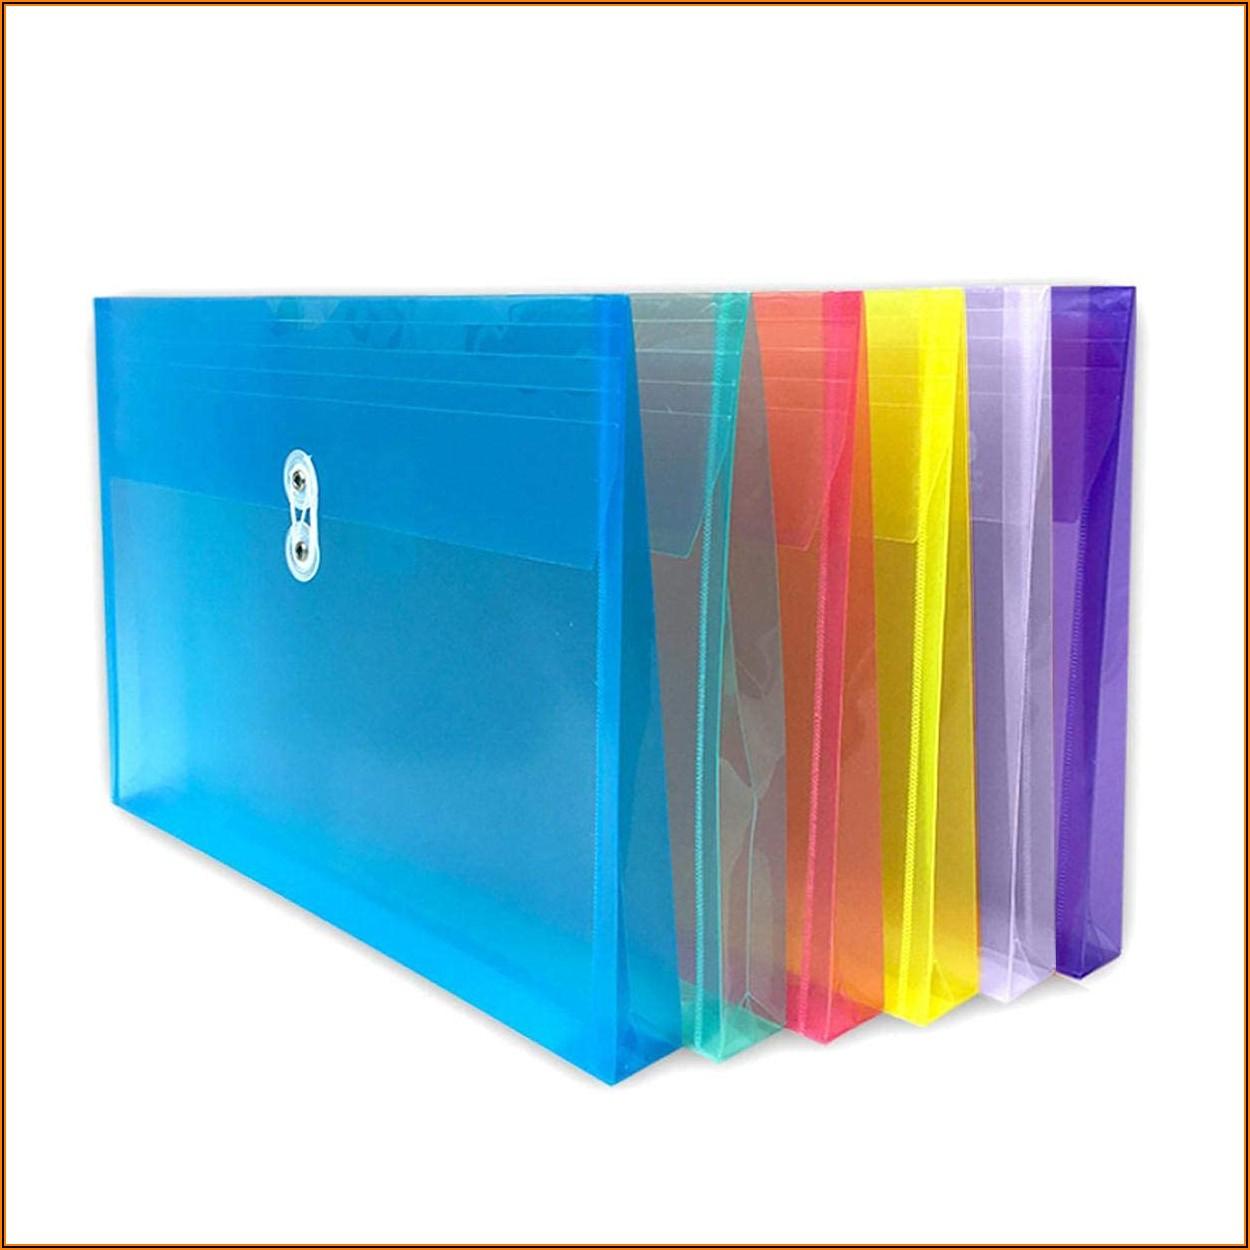 Plastic Envelopes With String Closure